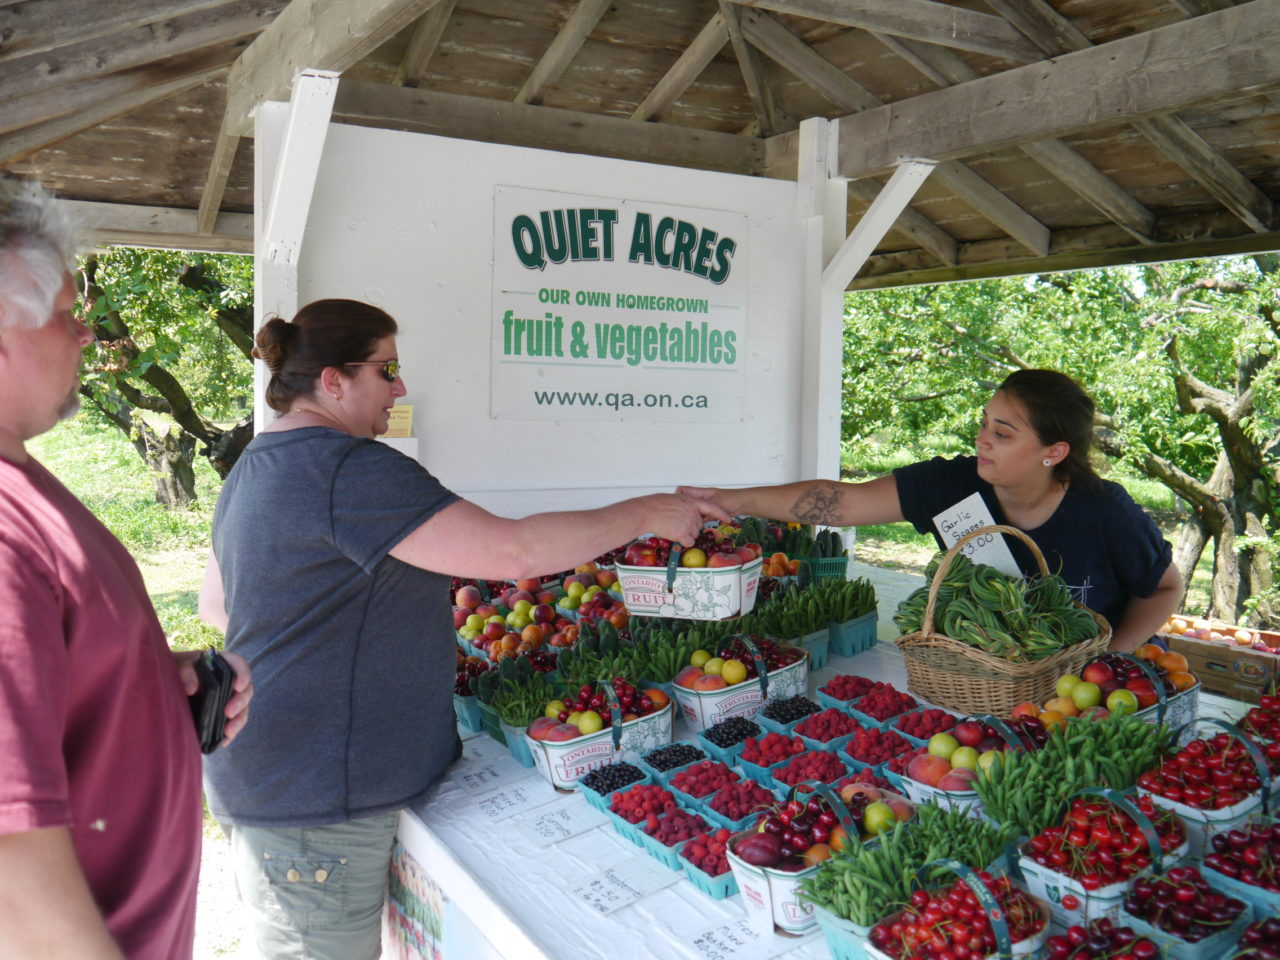 Niagara Falls farmers markets